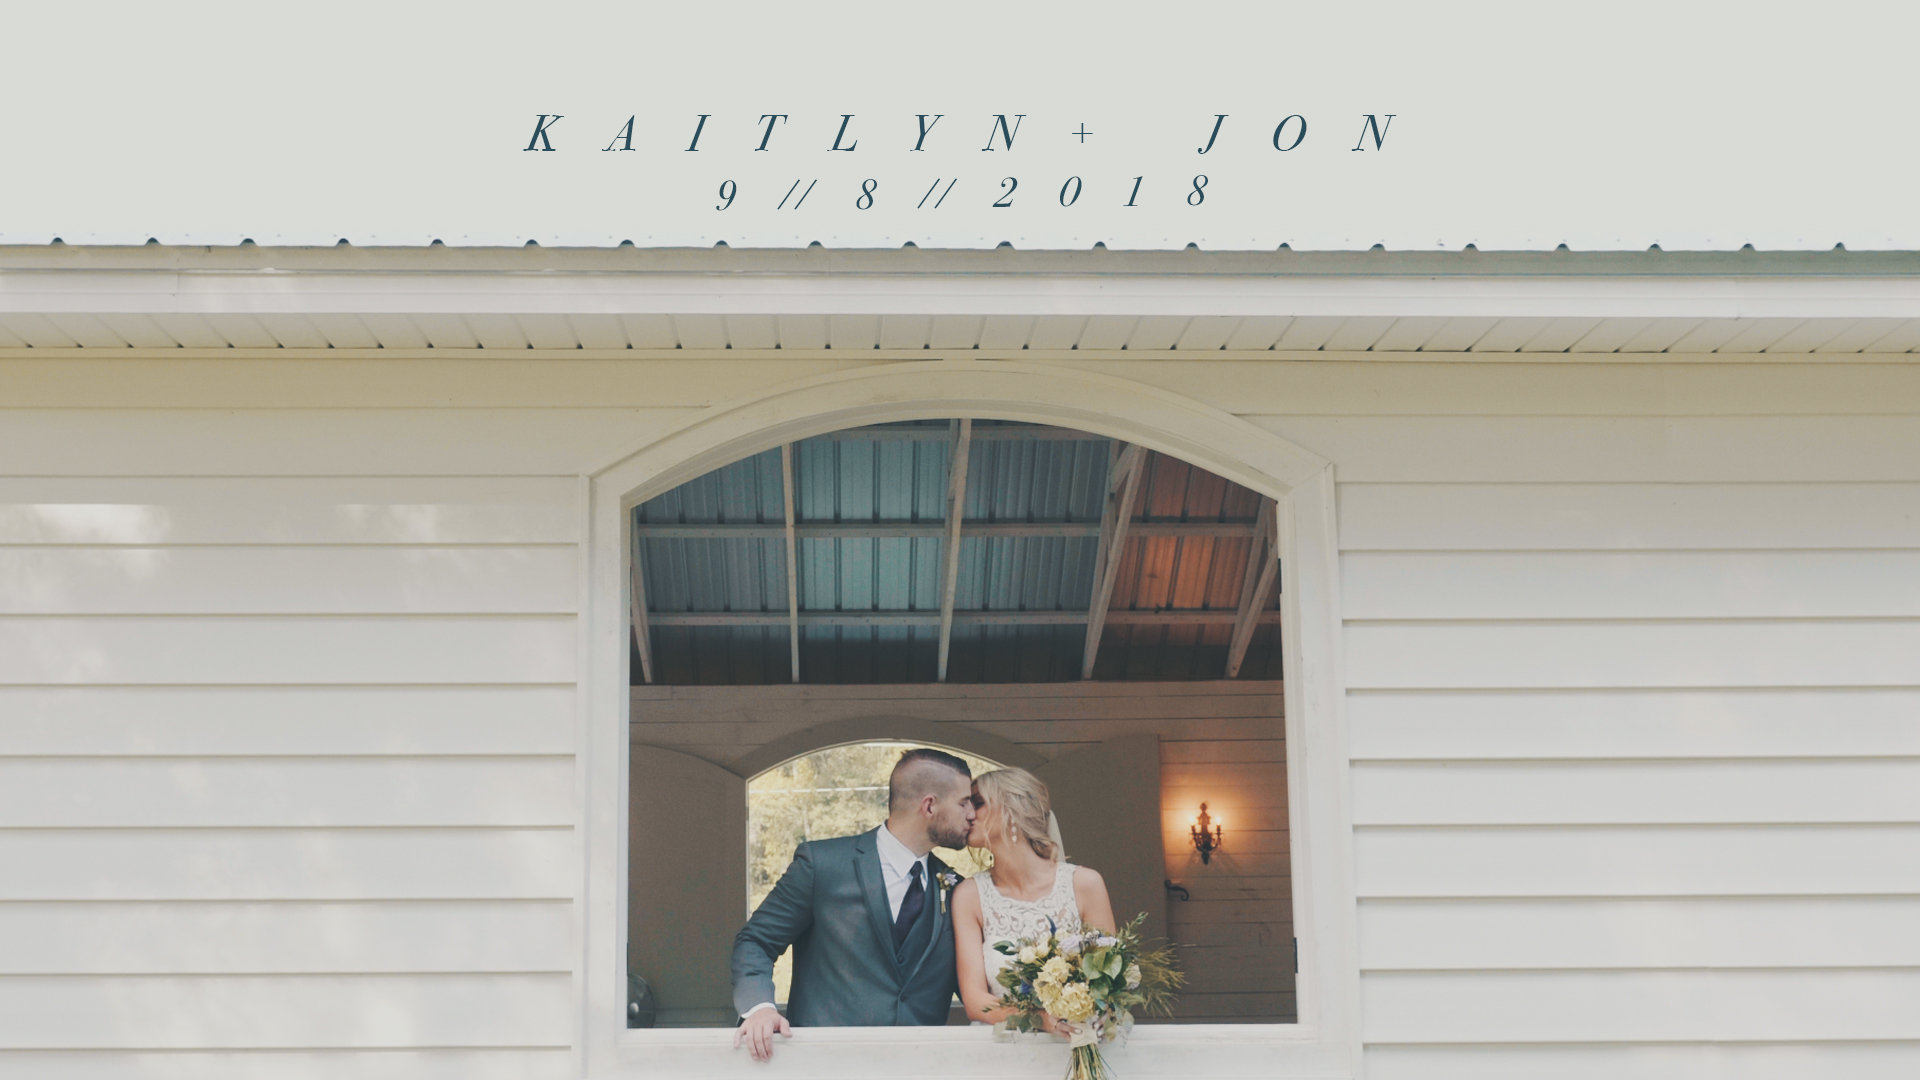 Kaitlyn + Jon | Tuscaloosa, Alabama | Southern House and Garden, Tuscaloosa